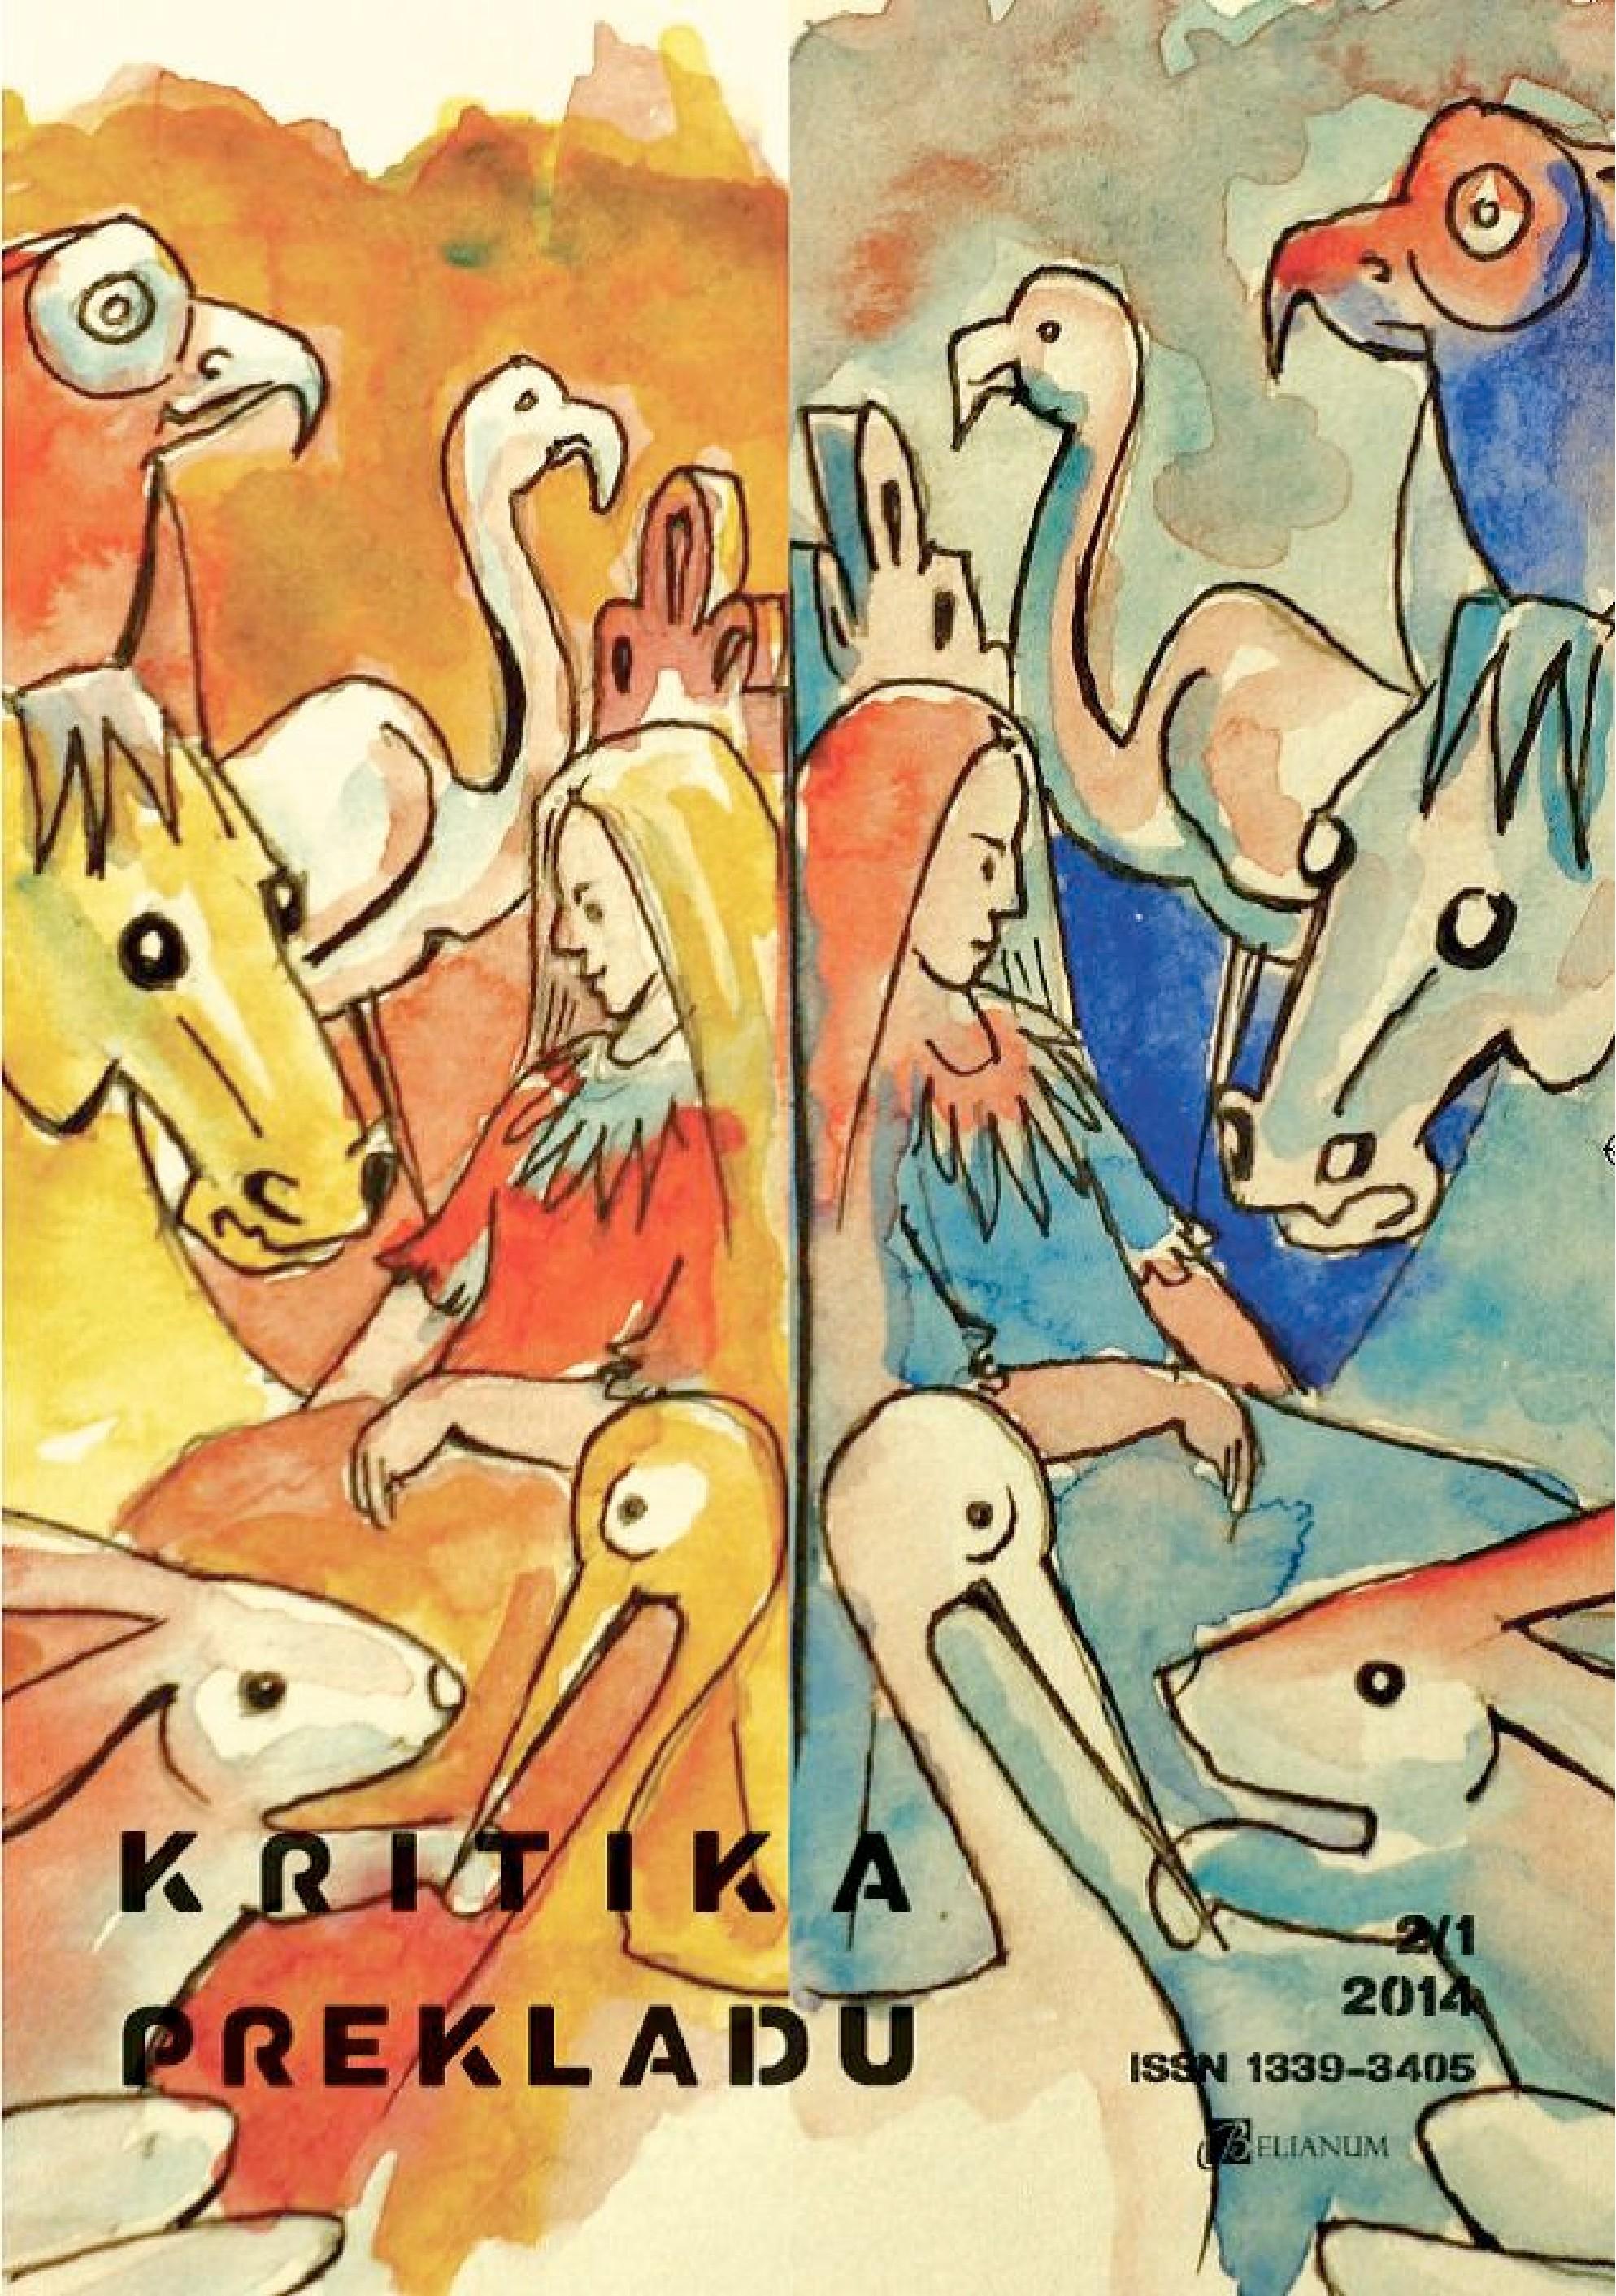 Kritika prekladu 2/1, 2014